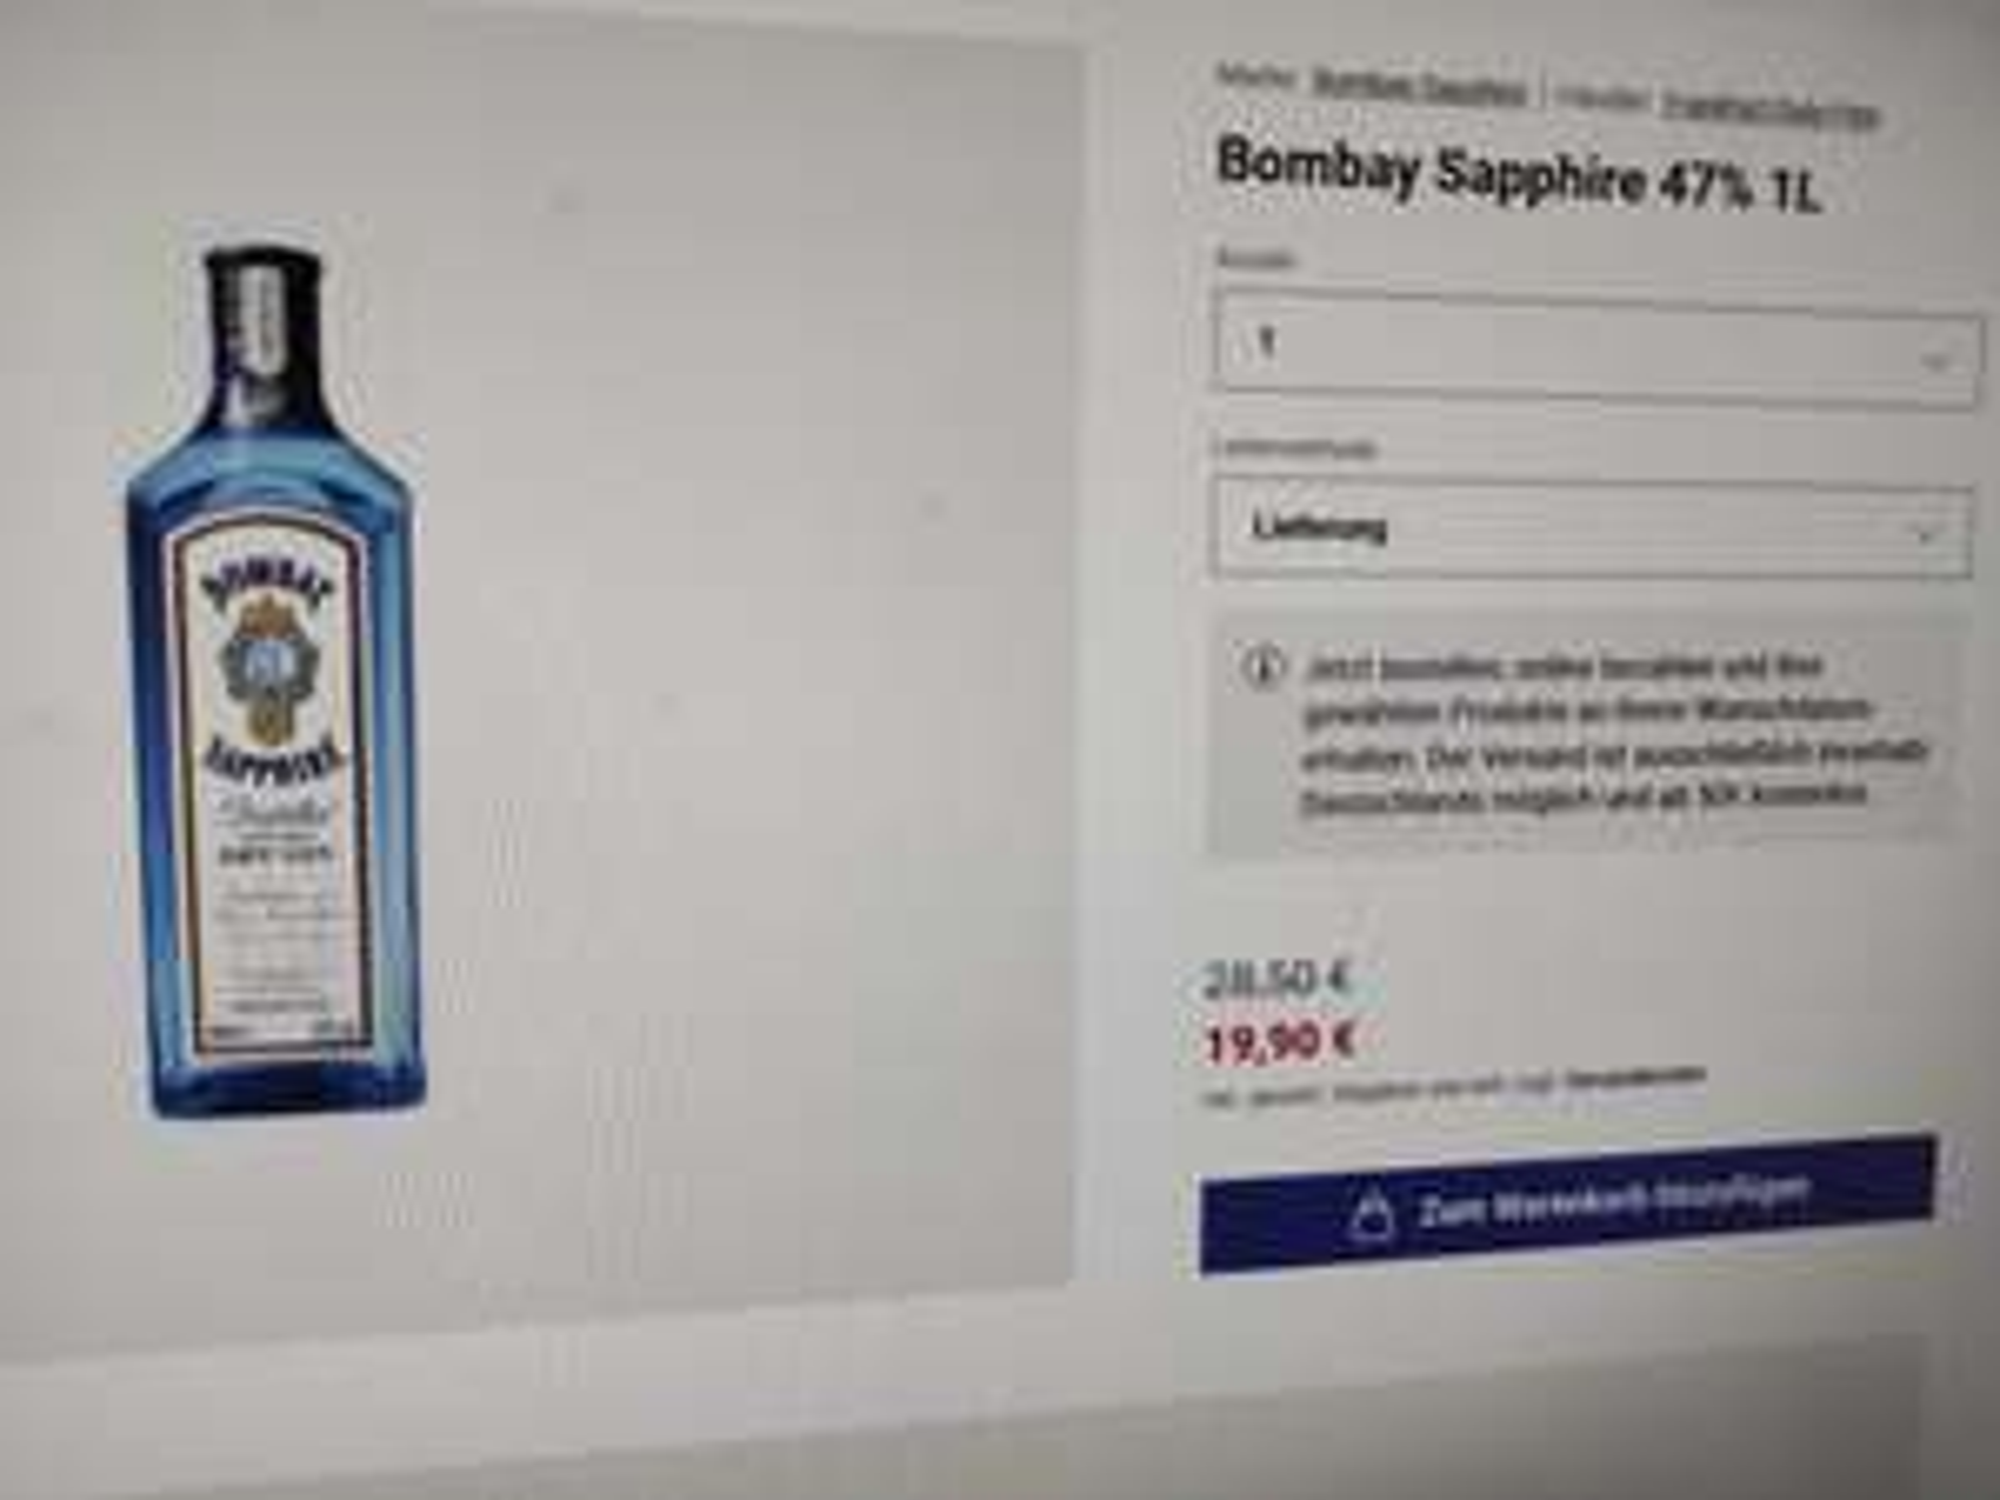 Bombay Sapphire Gin 47% 1 Liter